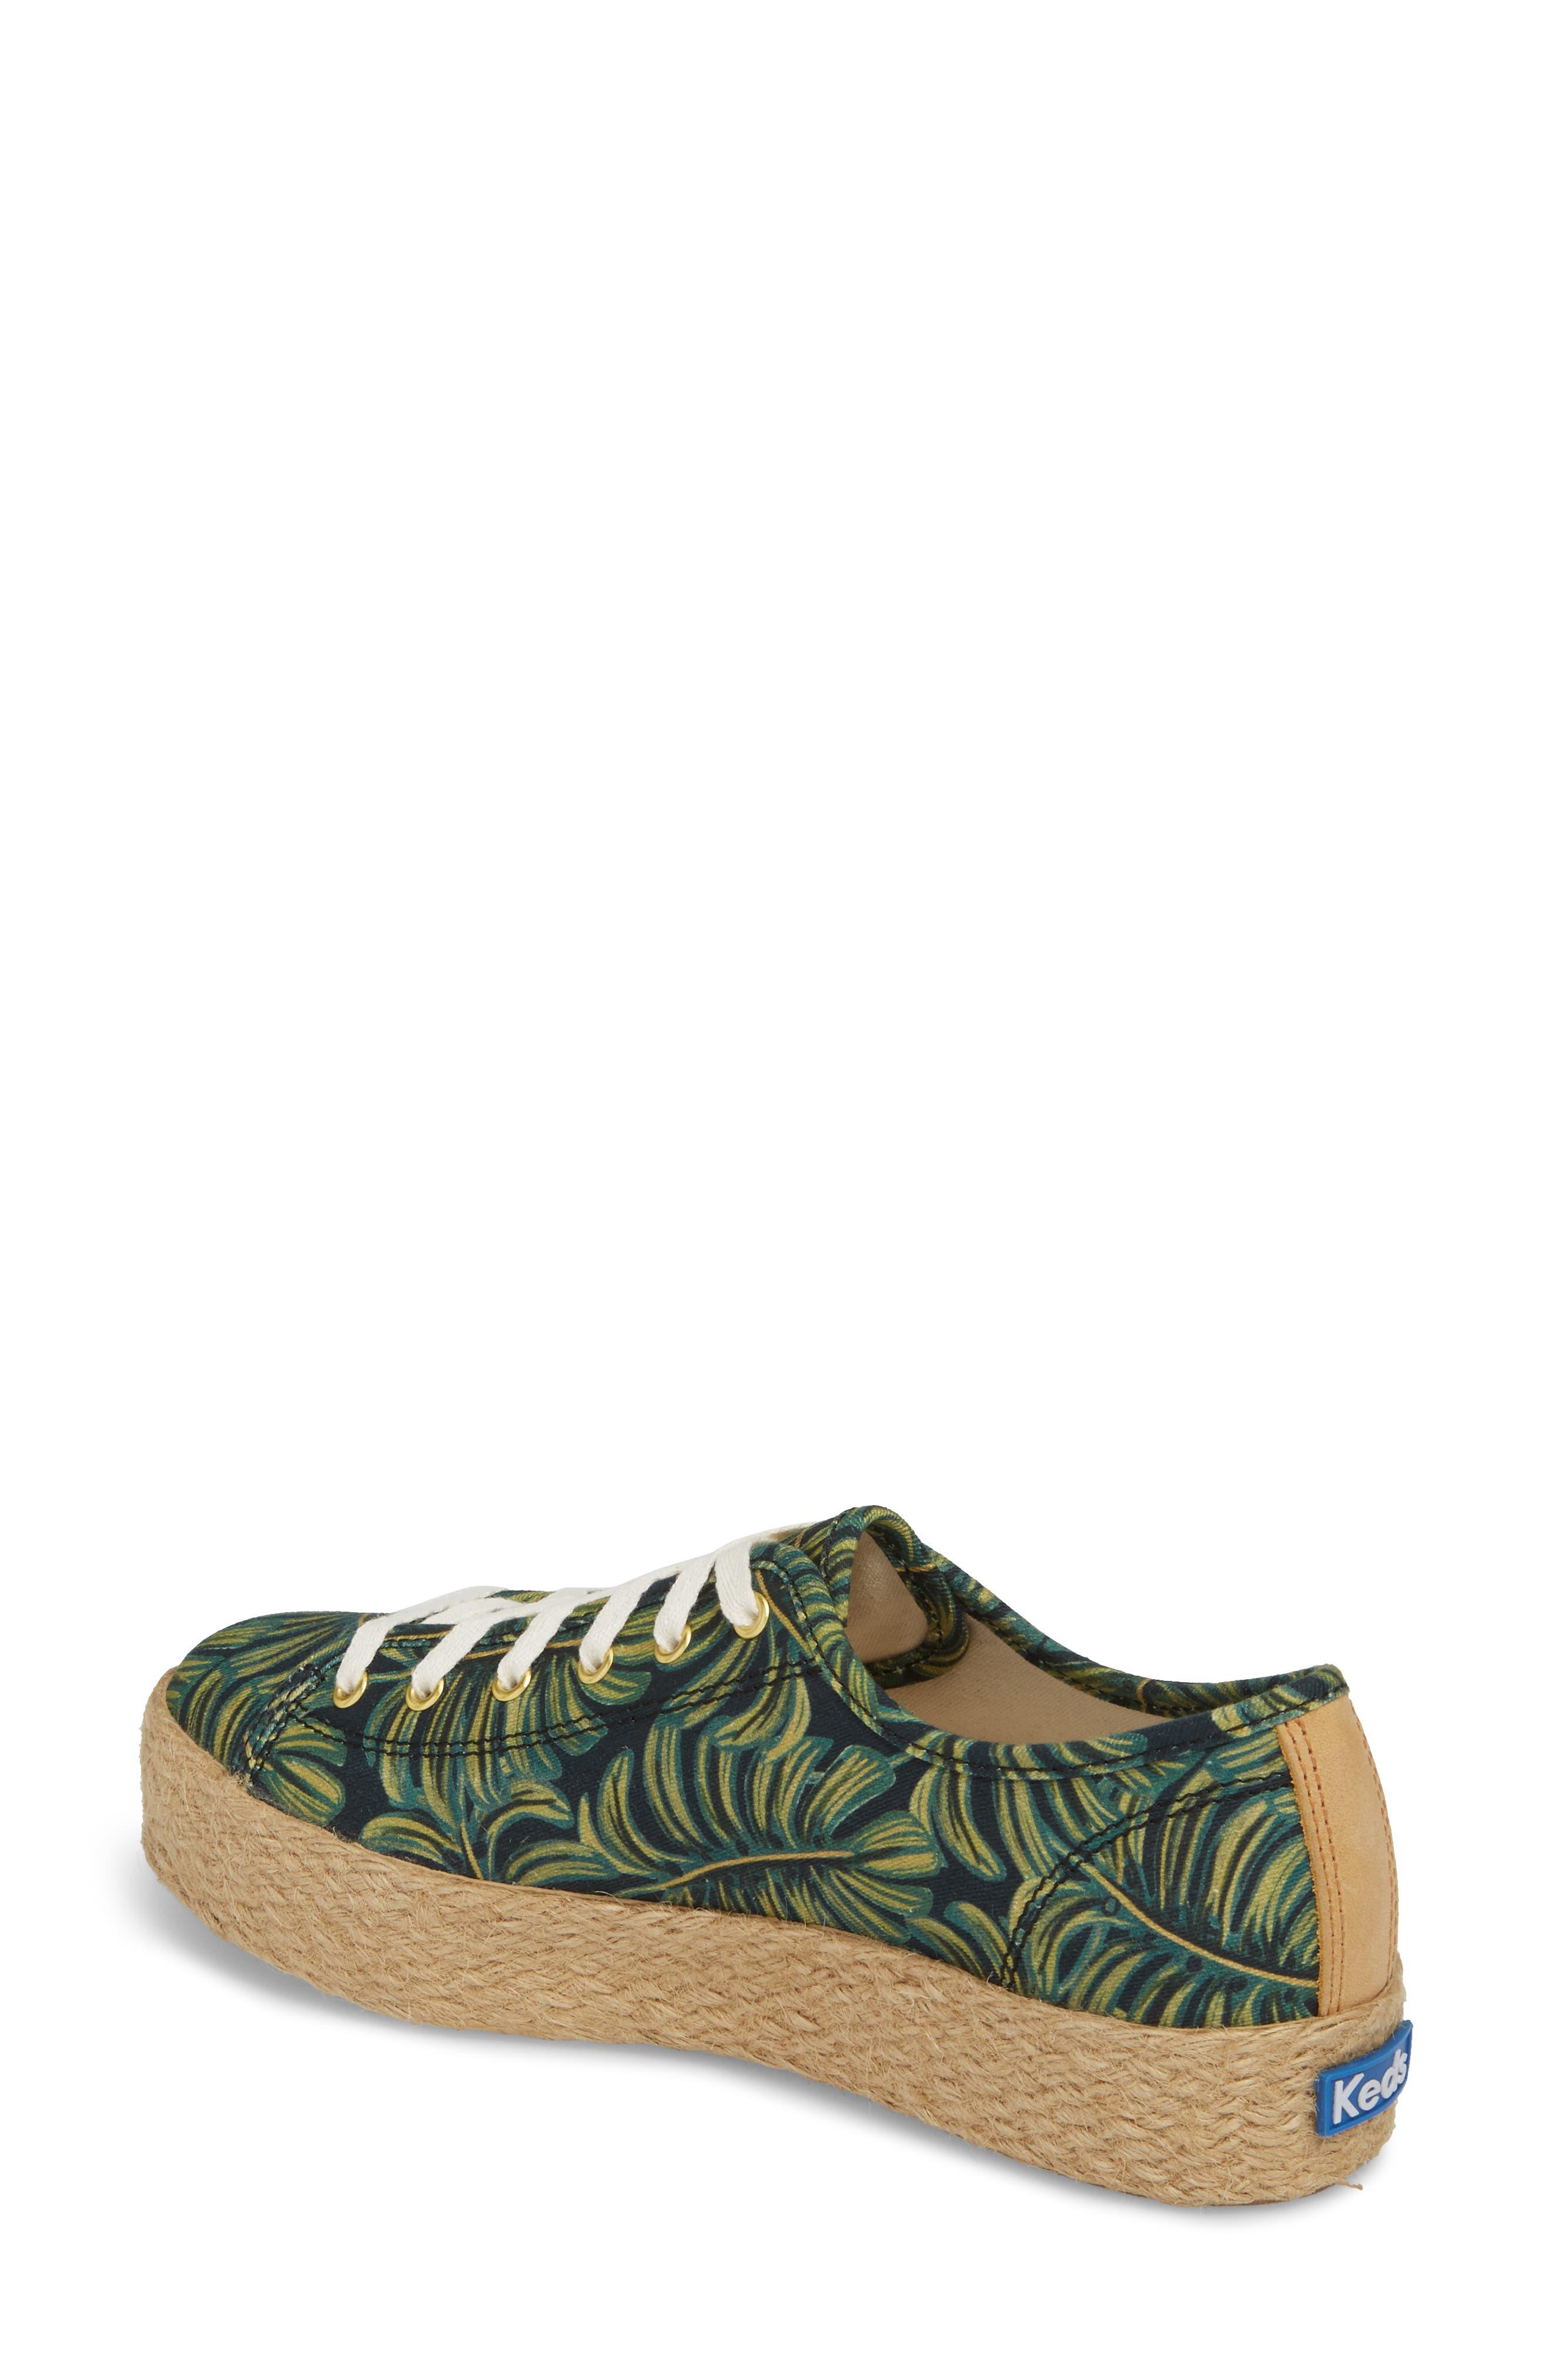 KEDS<SUP>®</SUP>, x Rifle Paper Co. Triple Kick Palms Platform Sneaker, Alternate thumbnail 2, color, 001